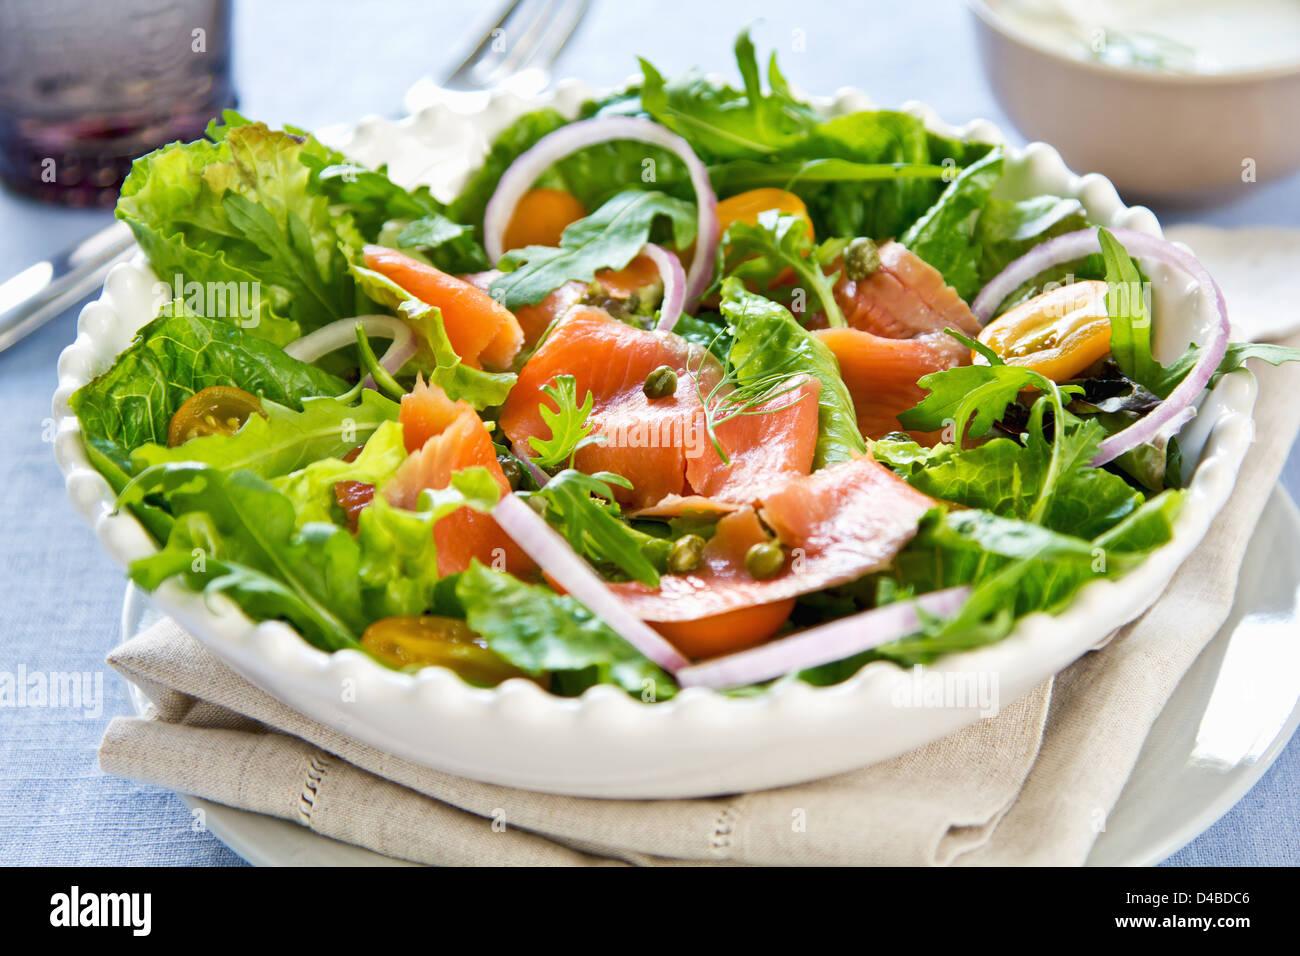 Smoked Salmon Salad With Sour Cream Dressing Stock Photo